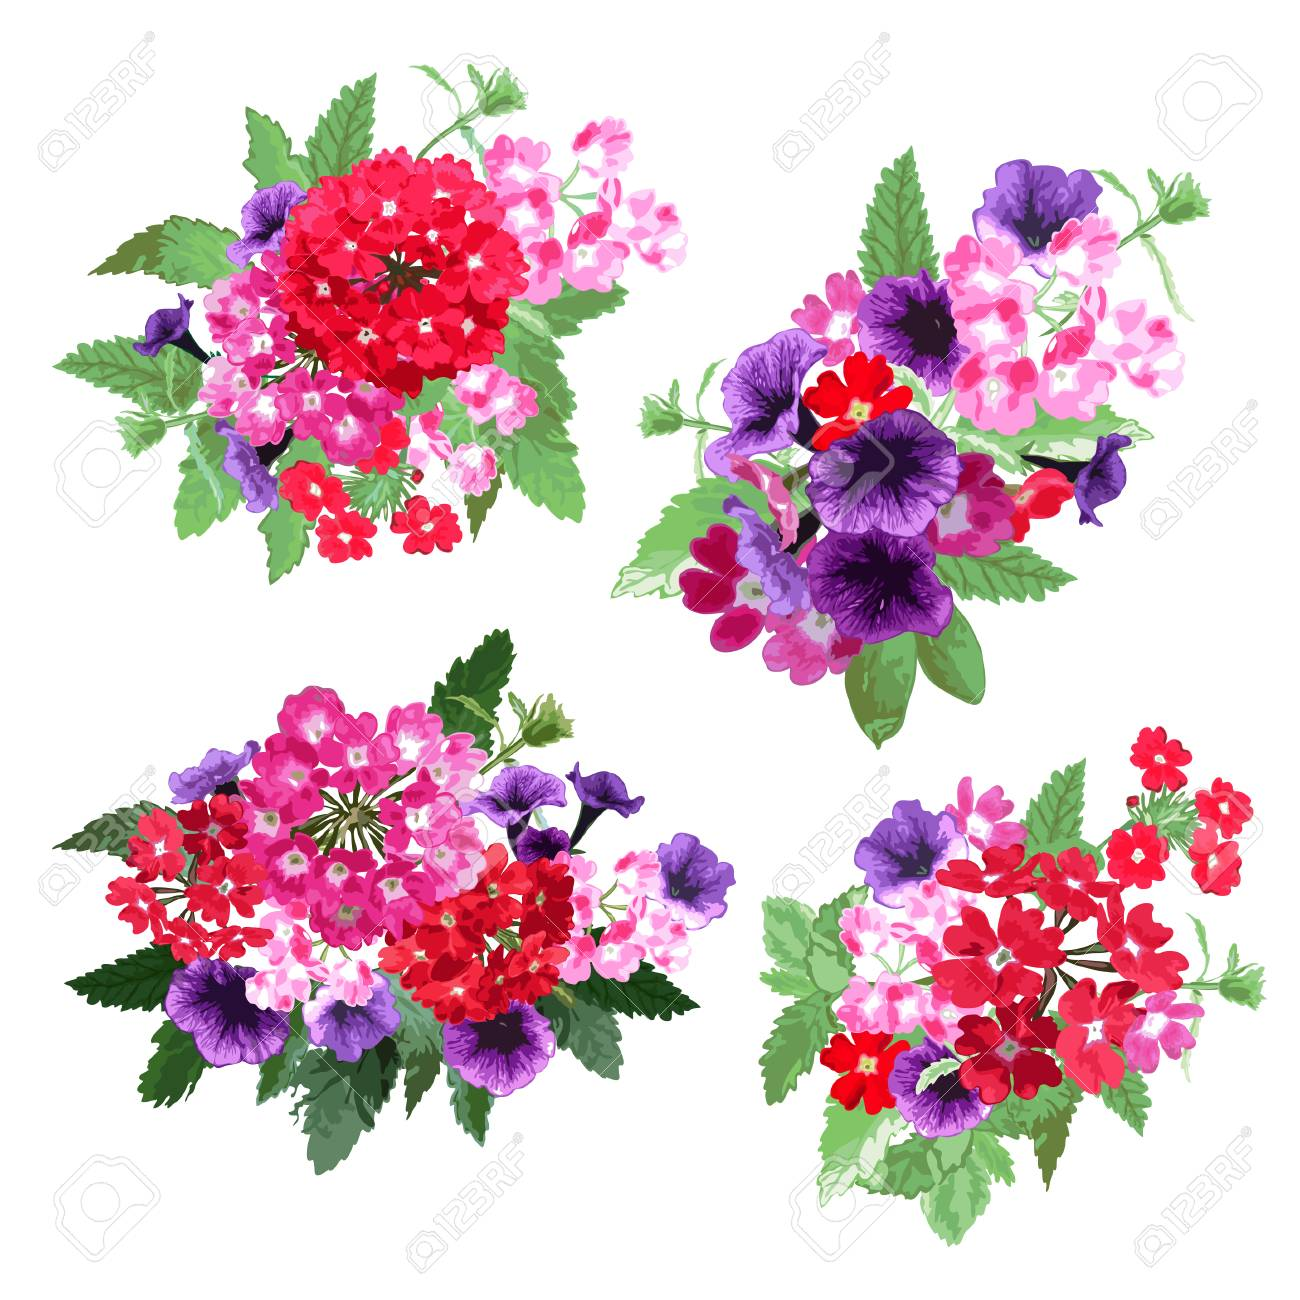 Elegant floral bouquets design elements floral compositions elegant floral bouquets design elements floral compositions can be used for wedding baby izmirmasajfo Choice Image